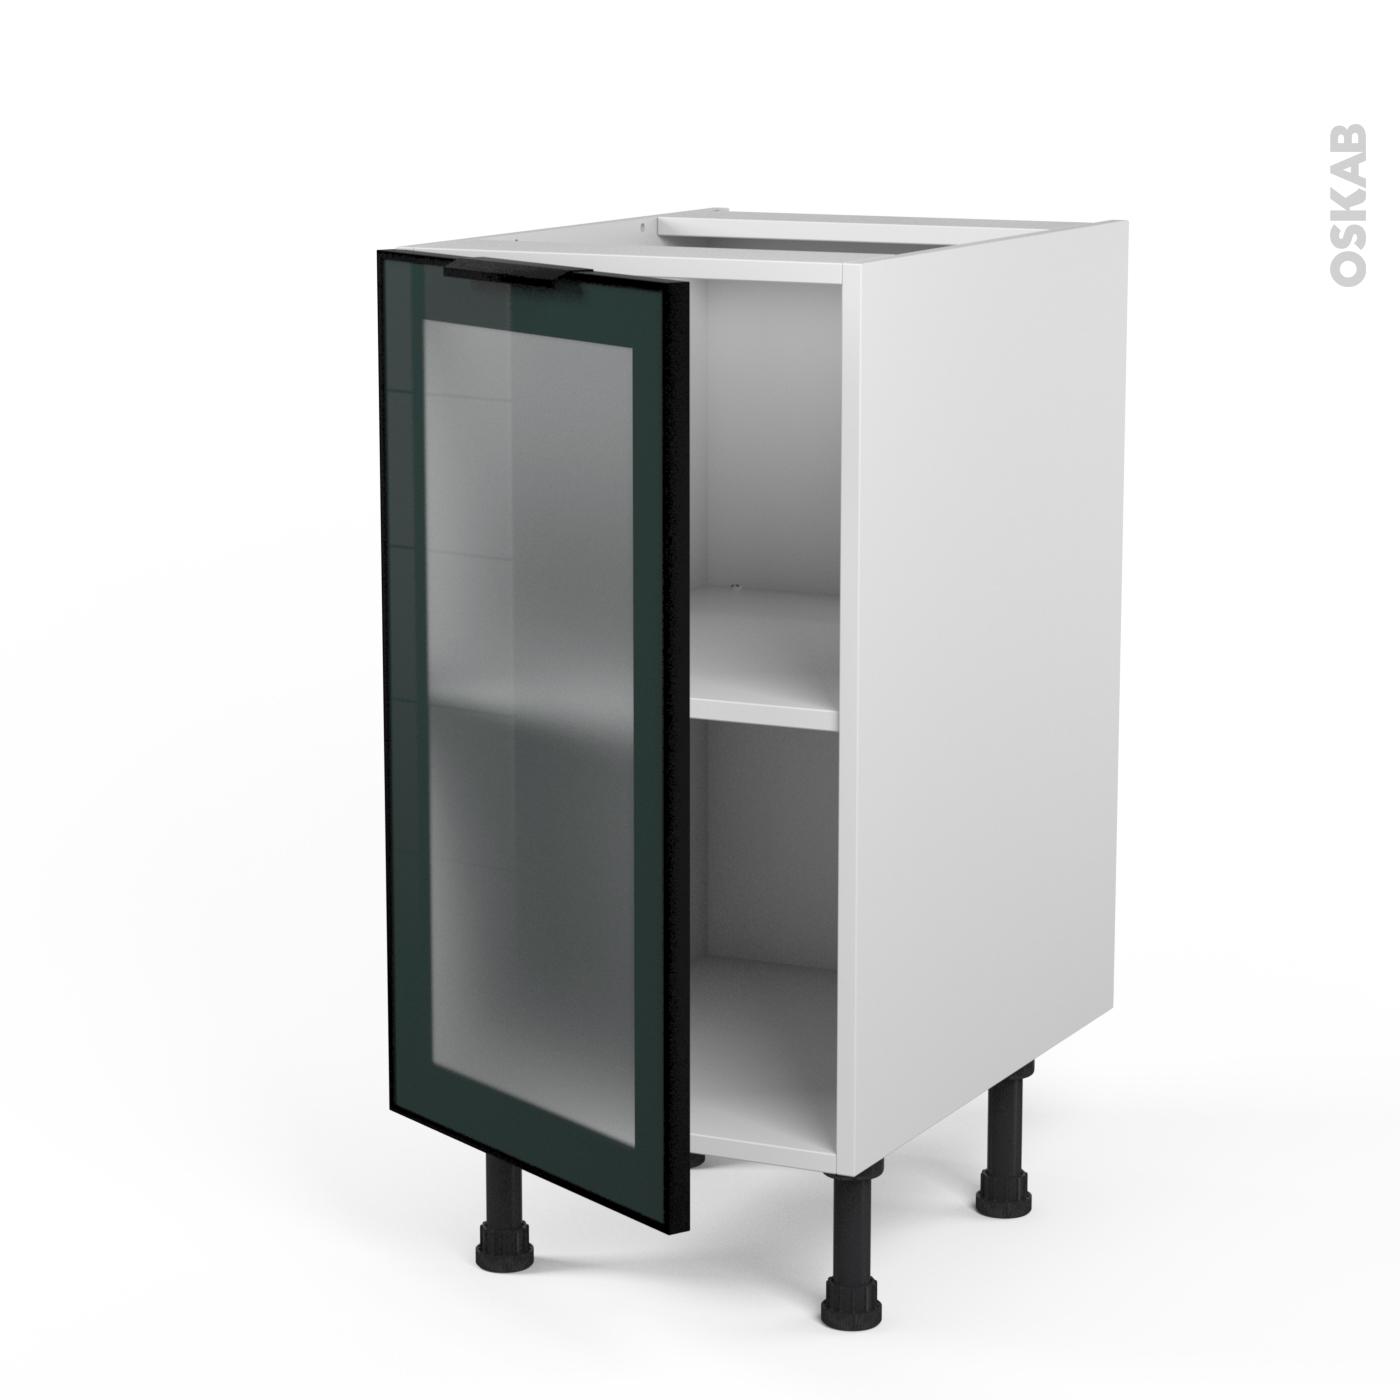 latest meuble de cuisine bas vitr faade noire alu porte l x h x p cm with meuble bas cuisine. Black Bedroom Furniture Sets. Home Design Ideas